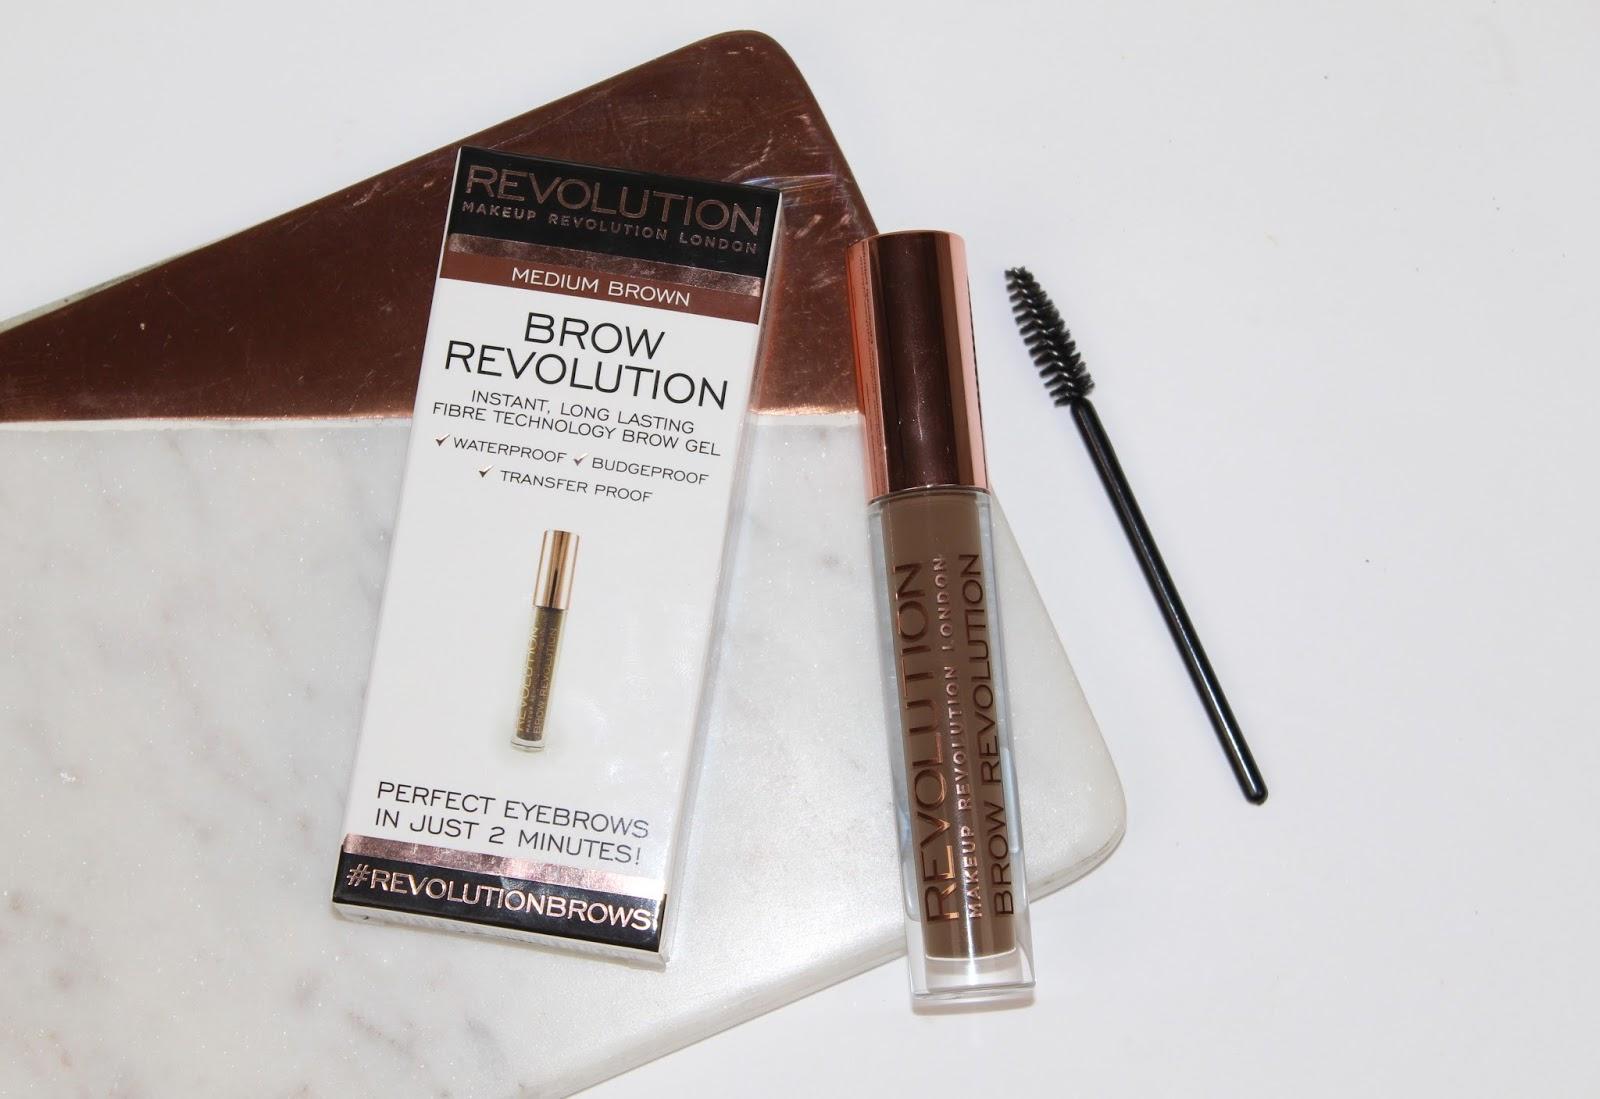 Makeup Revolution Brow Revolution Review and Photos - Wunderbrow Dupe